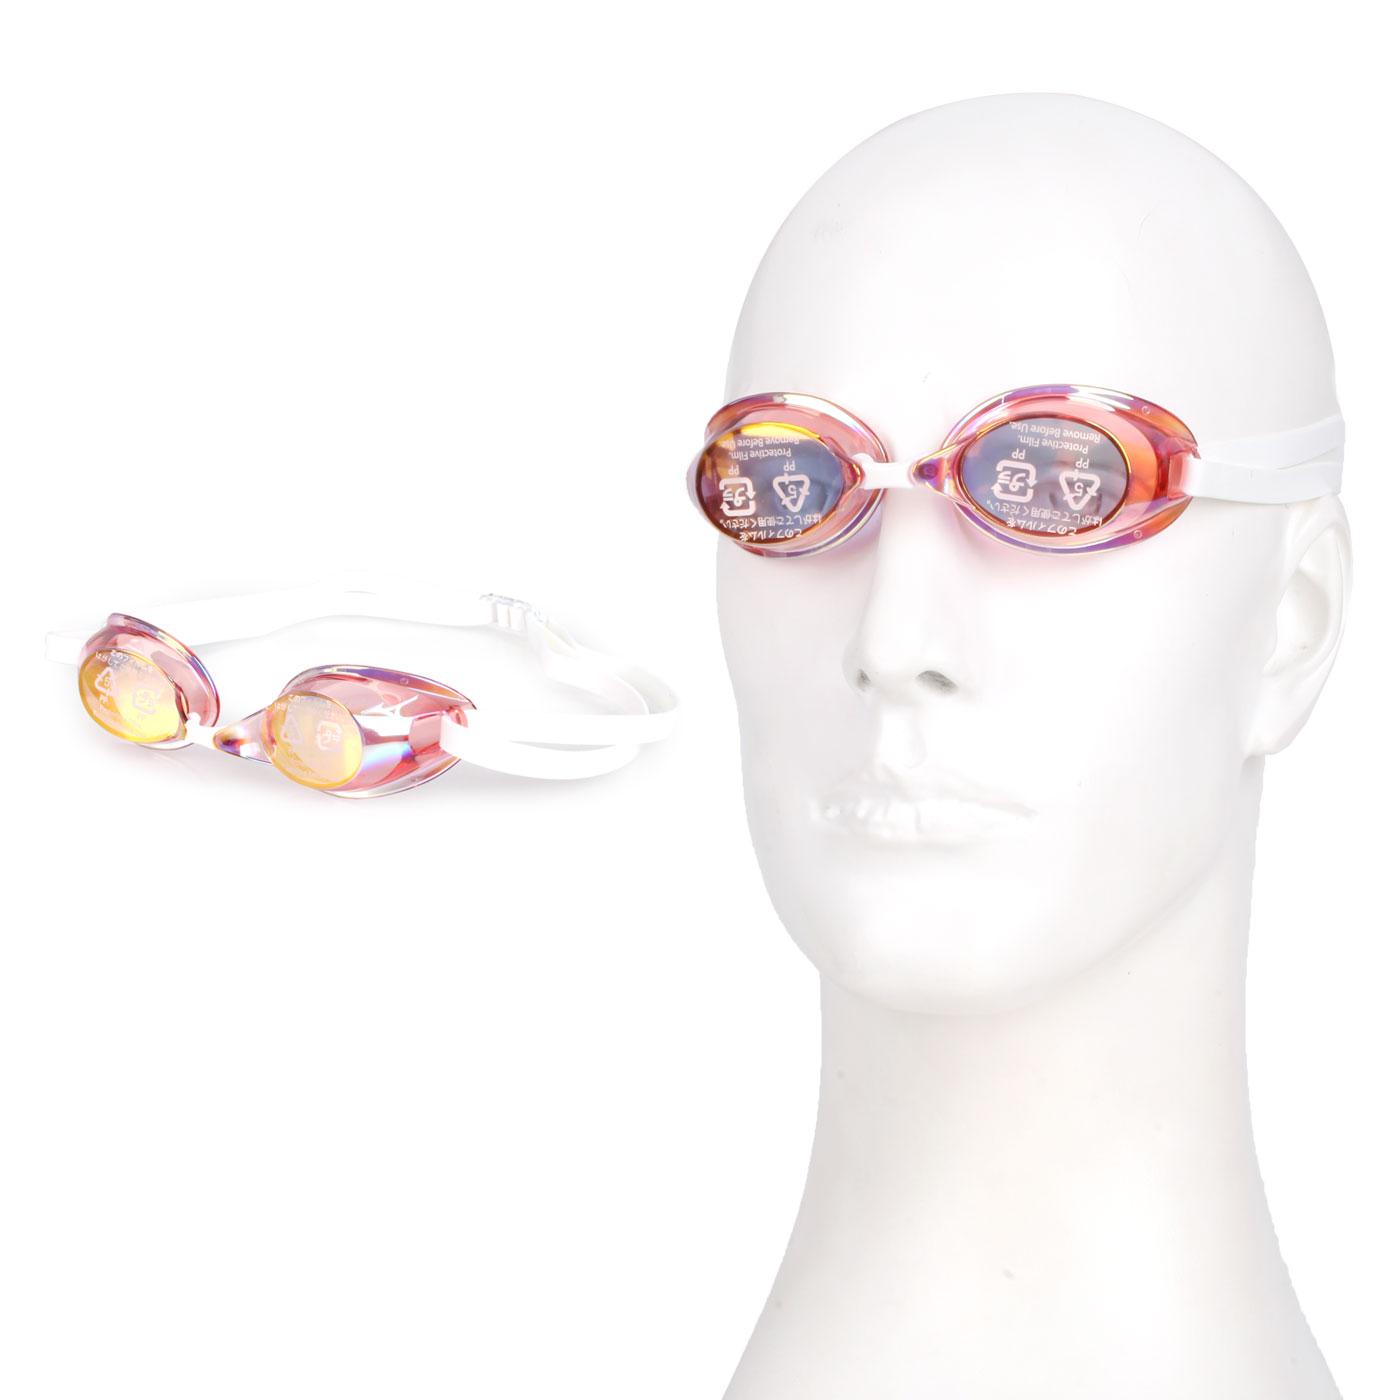 MIZUNO 日製競速型無墊片鍍膜泳鏡  SWIM85YA-75100-21 - 粉紅橘白